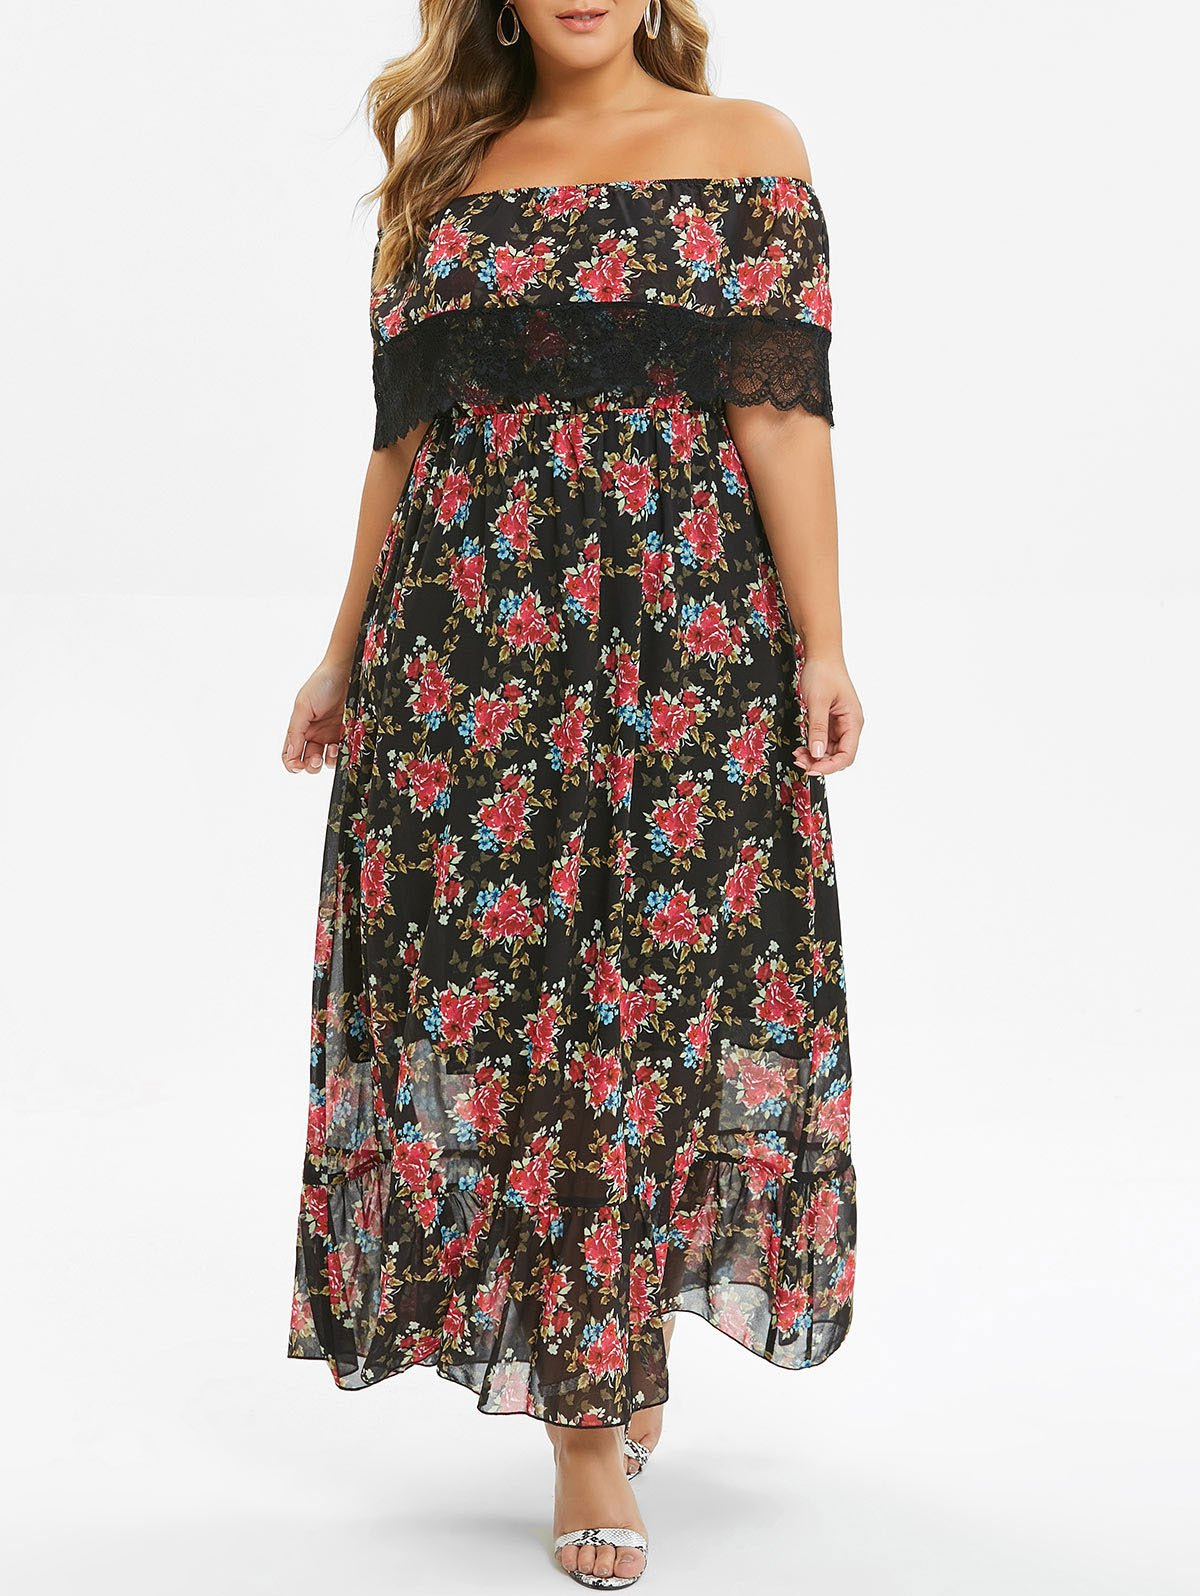 robe été fleurie chic